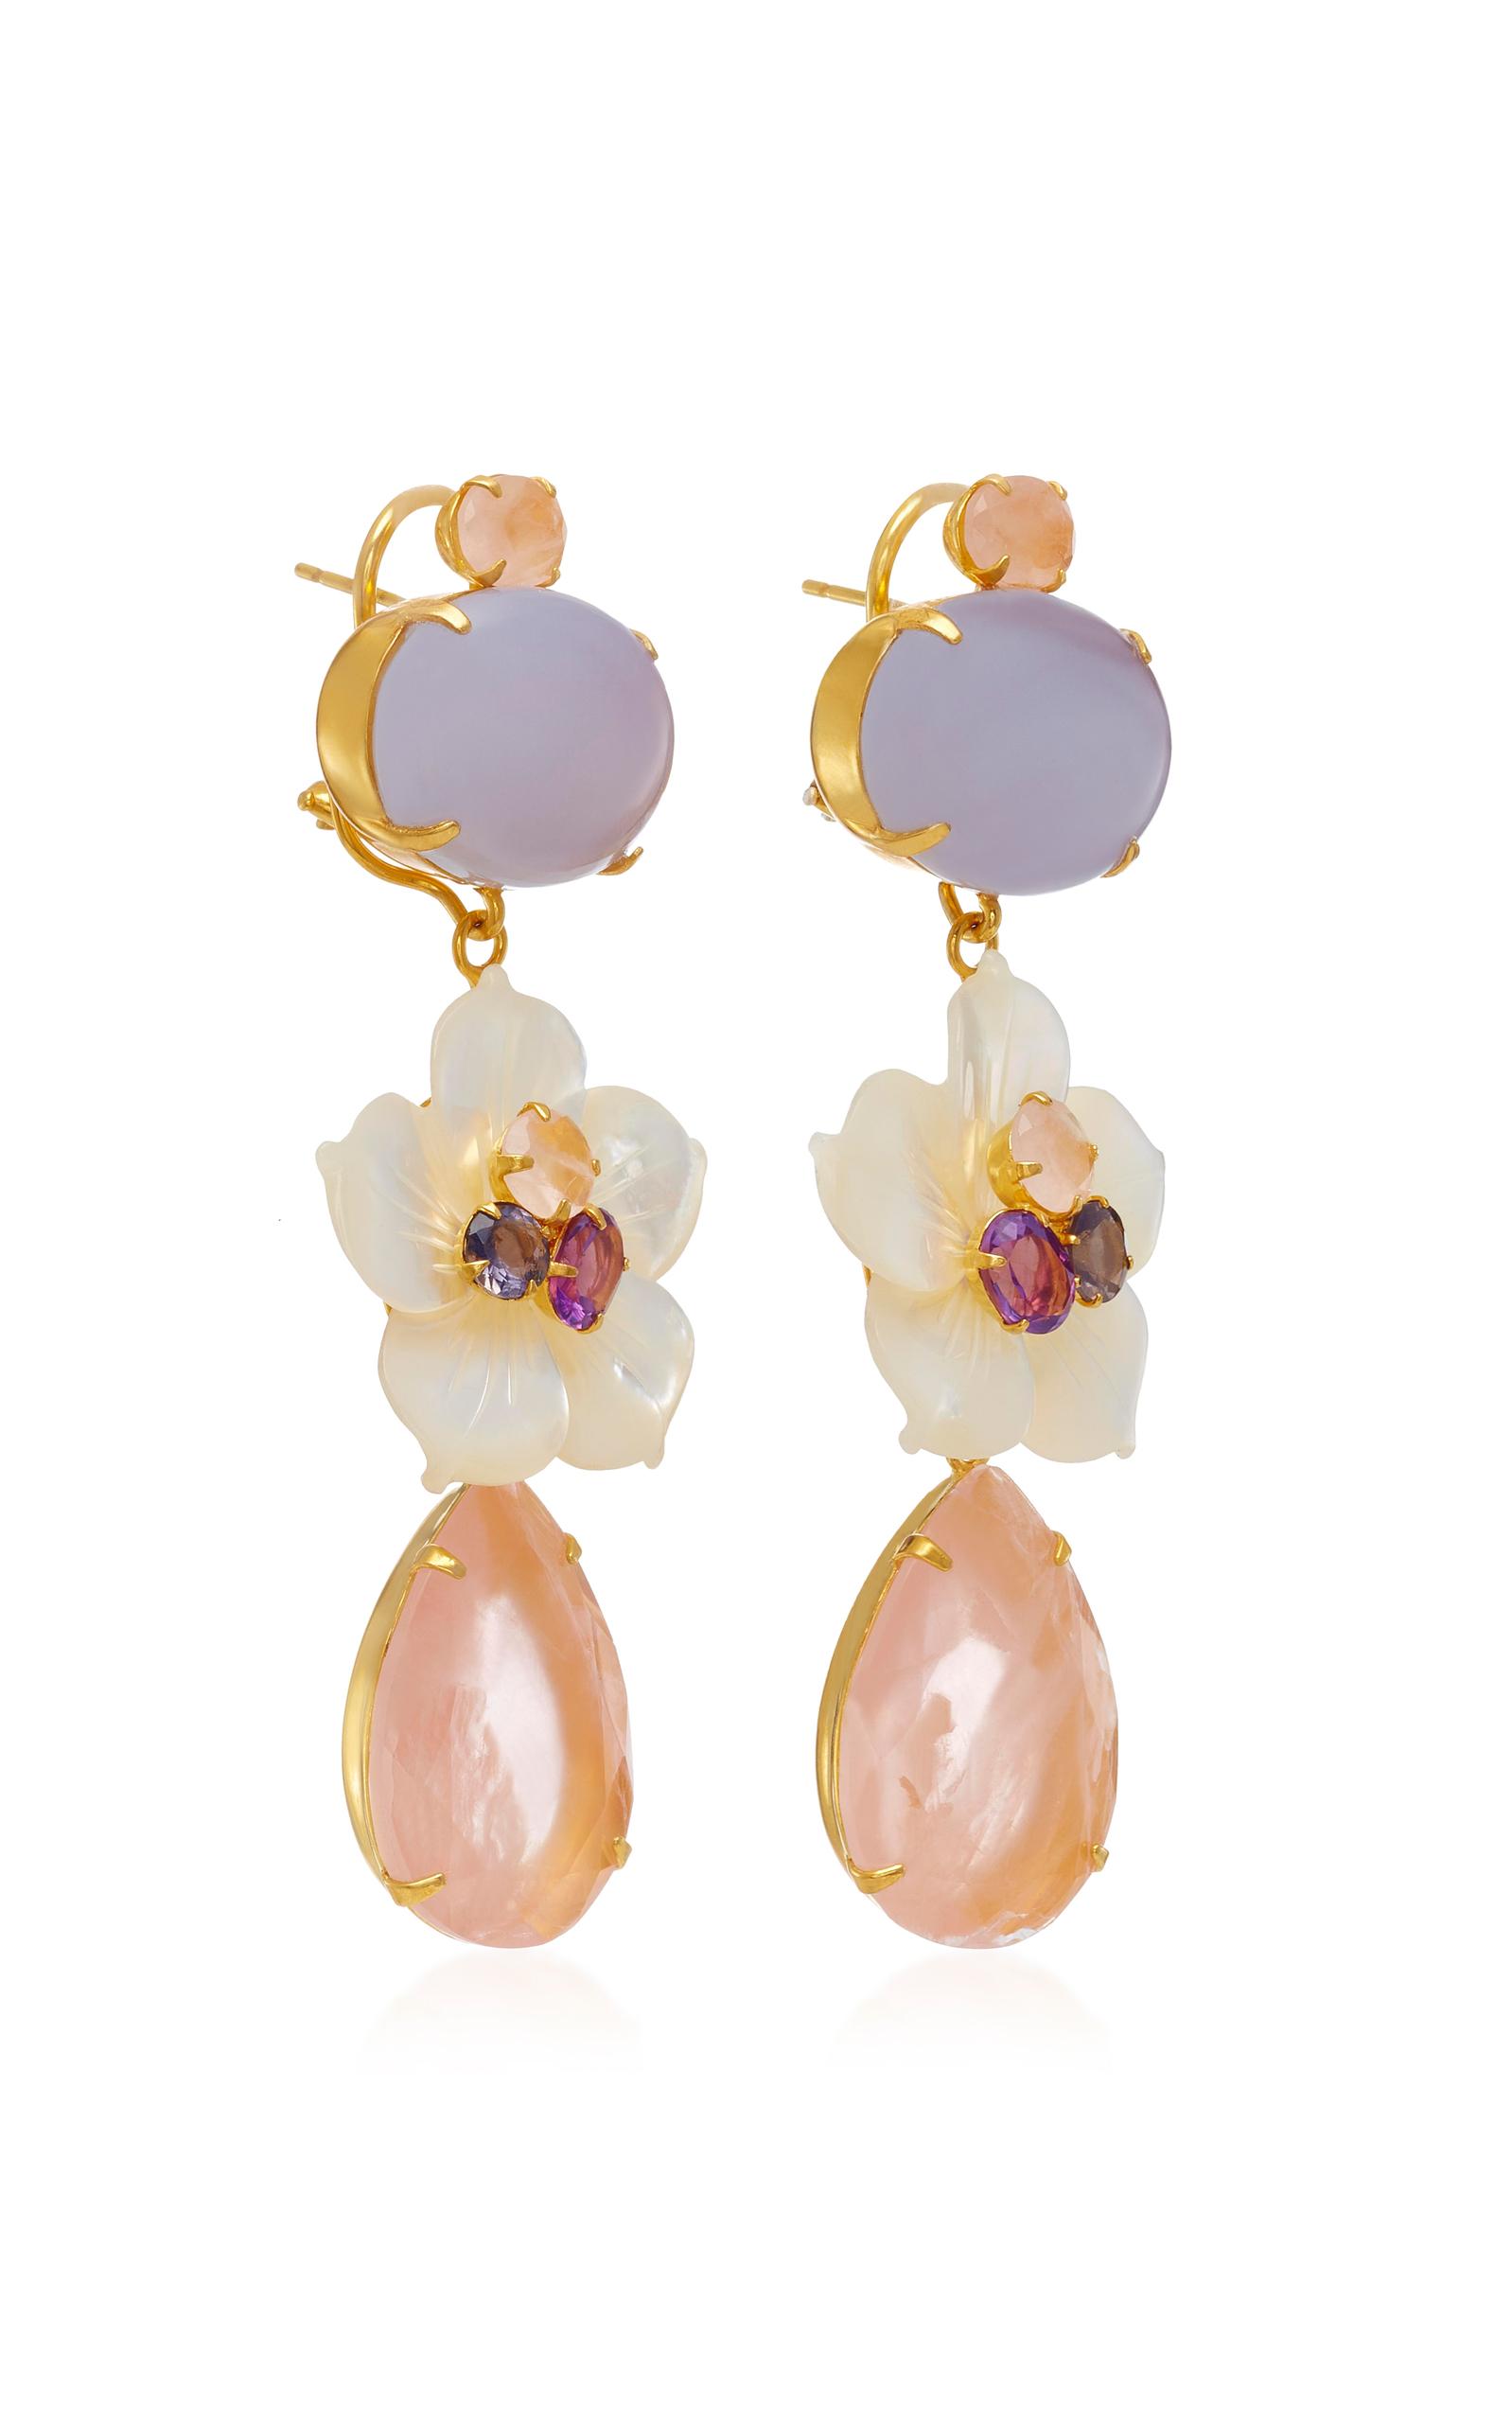 14K Gold-Plated Brass Chalcedony Mother of Pearl Amethyst Lolite Rose Quartz Earrings Bounkit 9ylJU